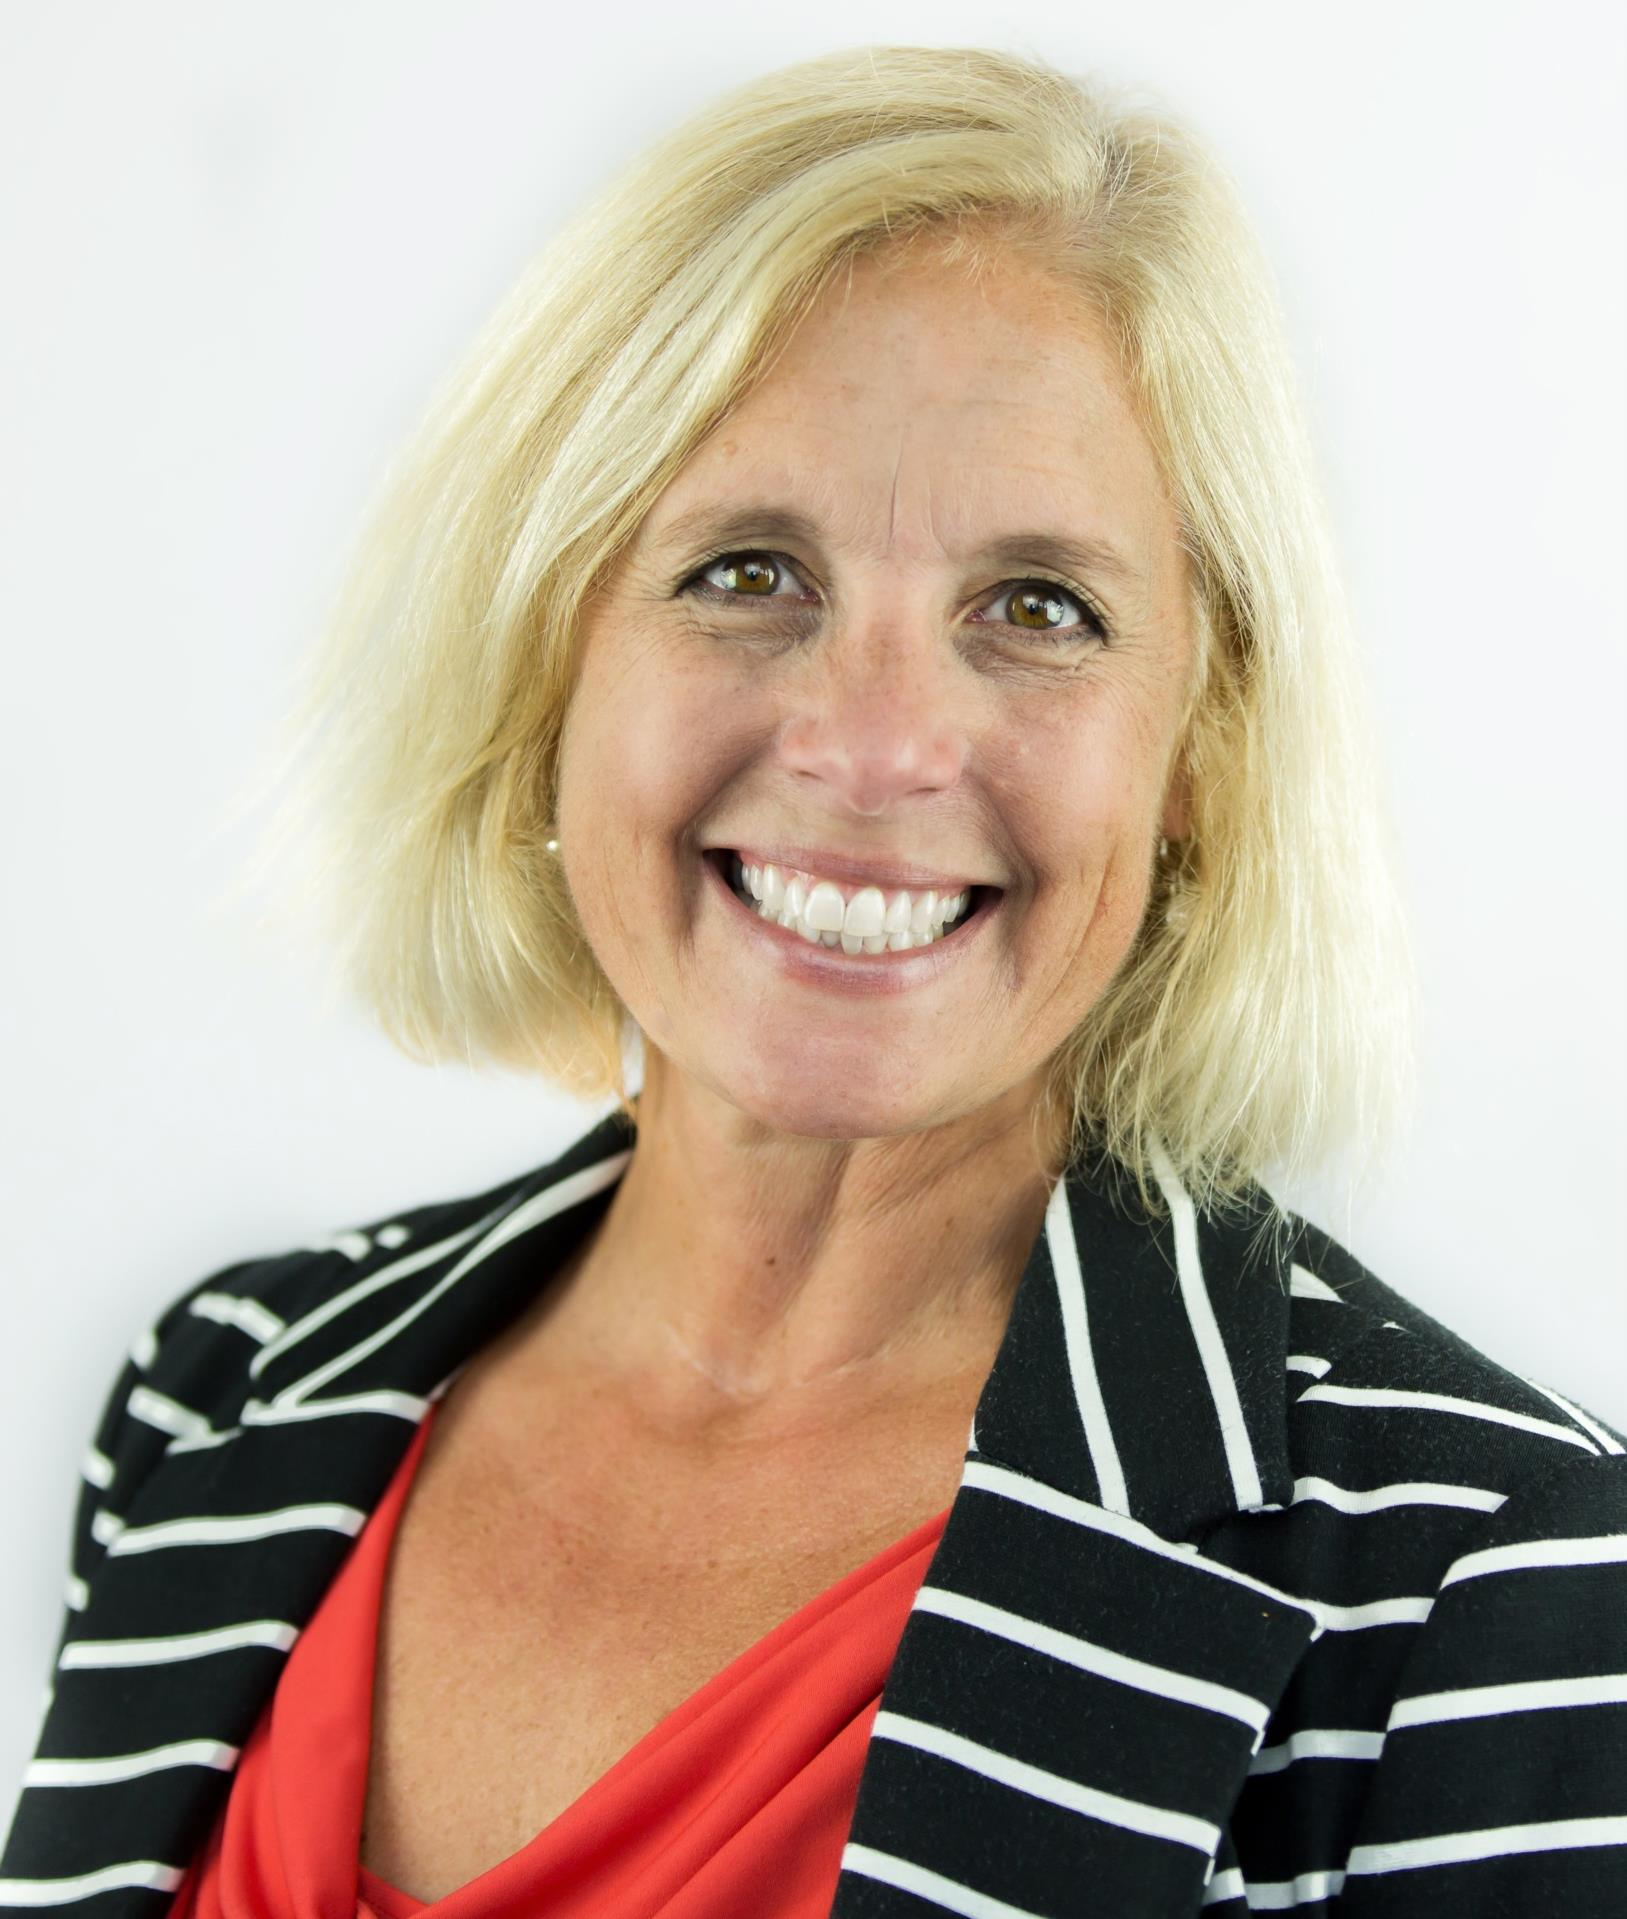 Dr. Amy Crouse